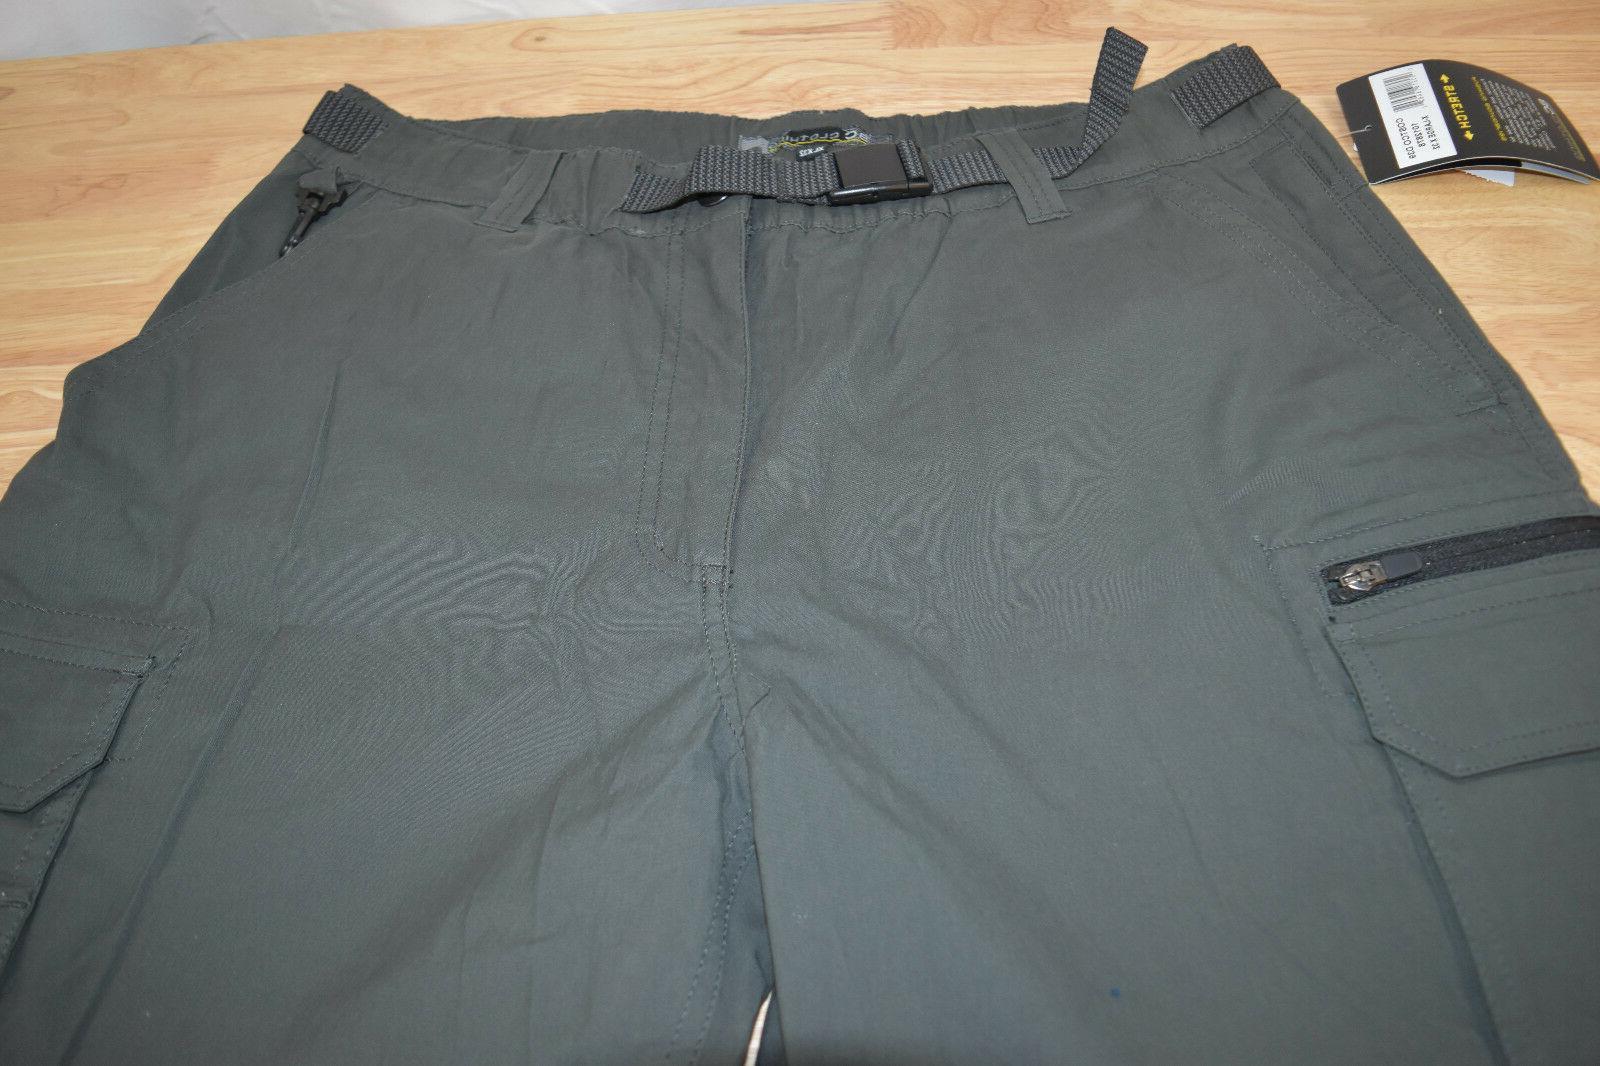 NWT BC Convertible Cargo Hiking Pants Shorts Stretch